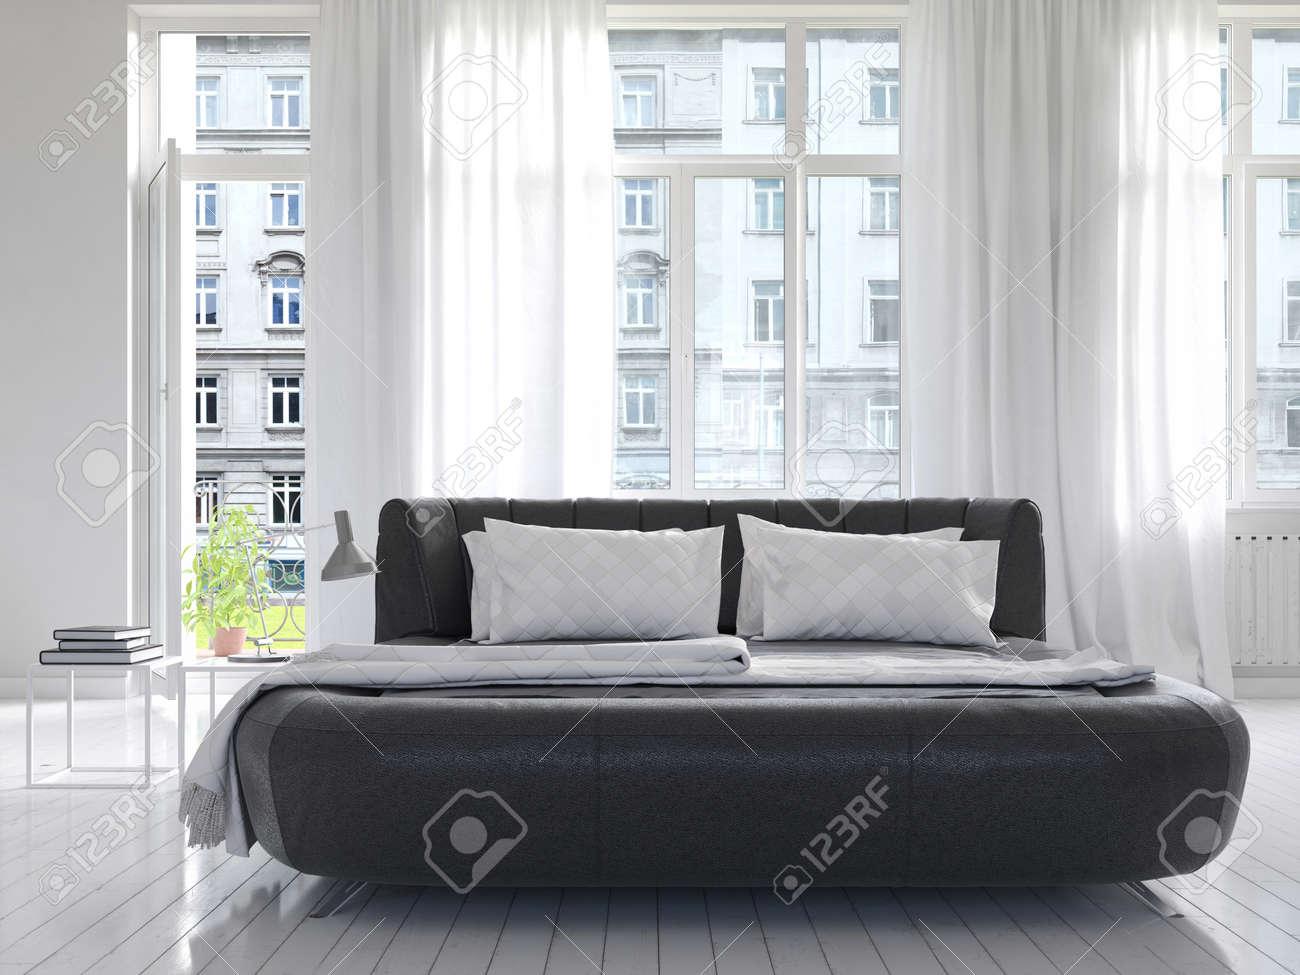 Modern lyx vit soligt sovrum inredning med svart king size säng ...